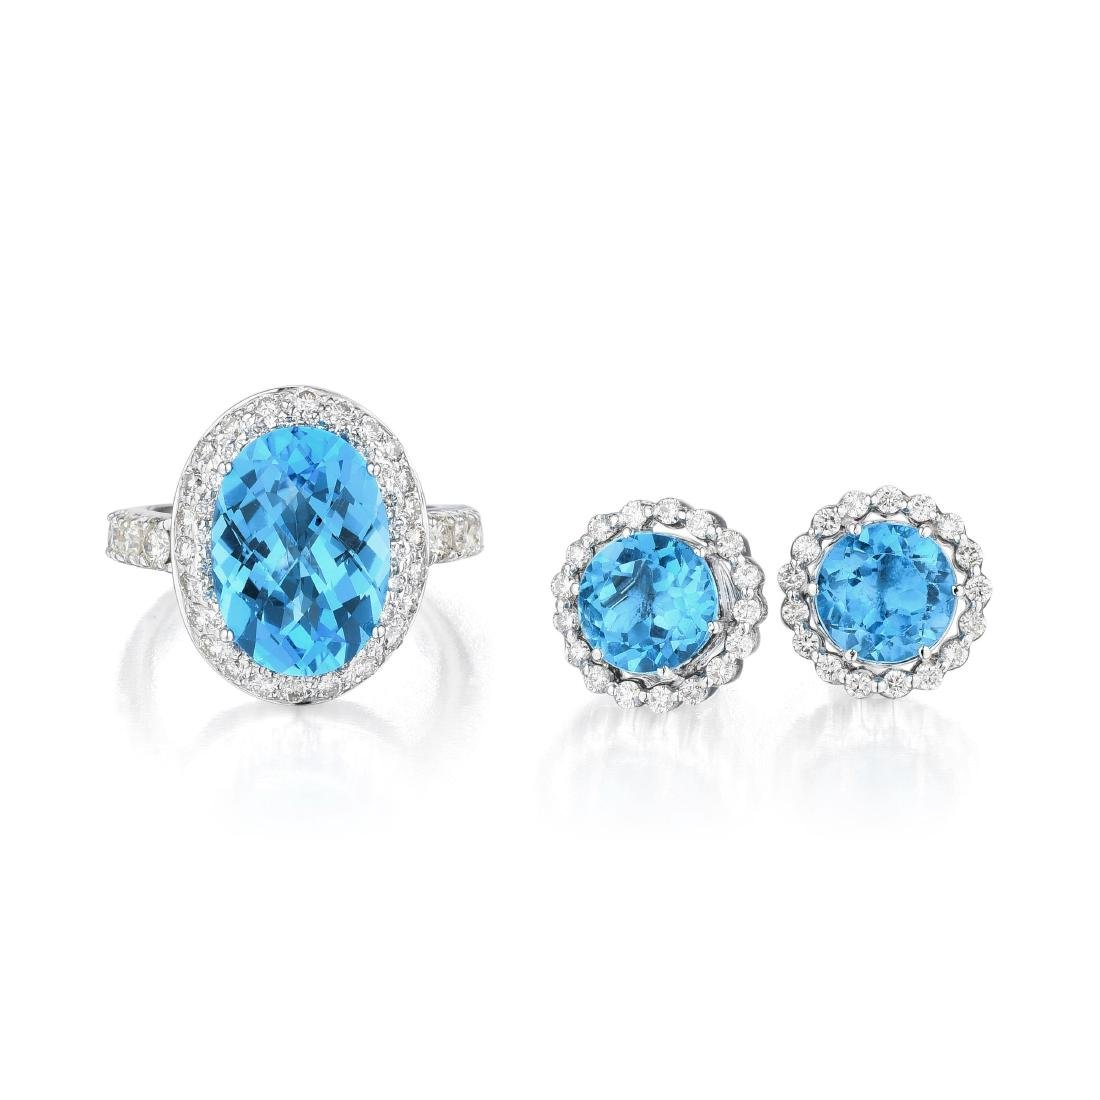 A Set of 18K White Gold, Topaz and Diamond Jewelry